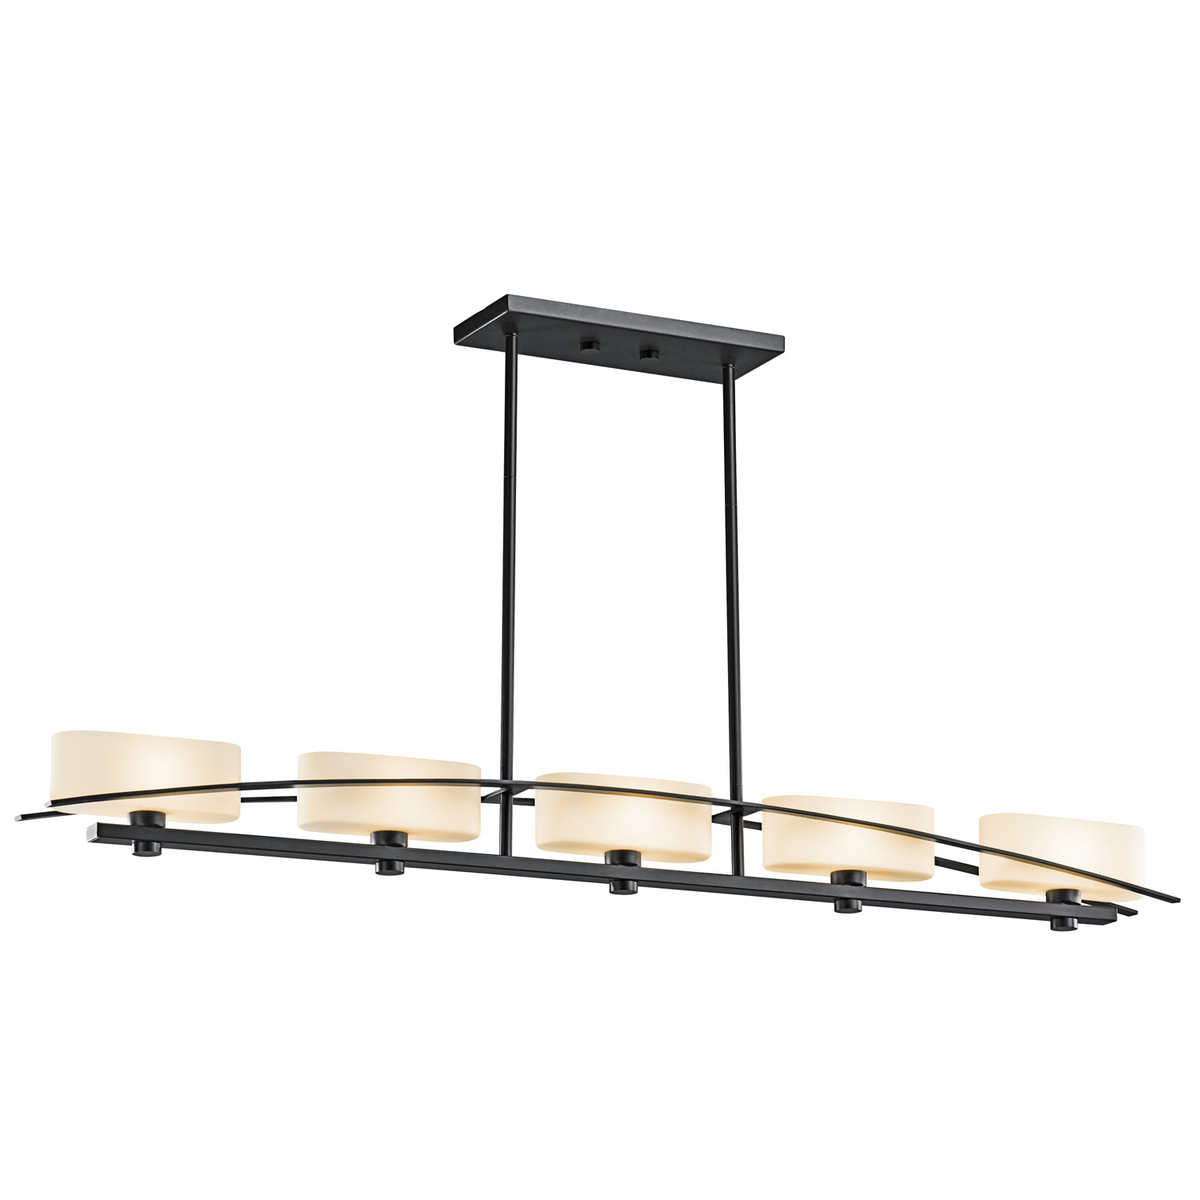 Kichler Suspension 5-Light 4.25 in Black Finish